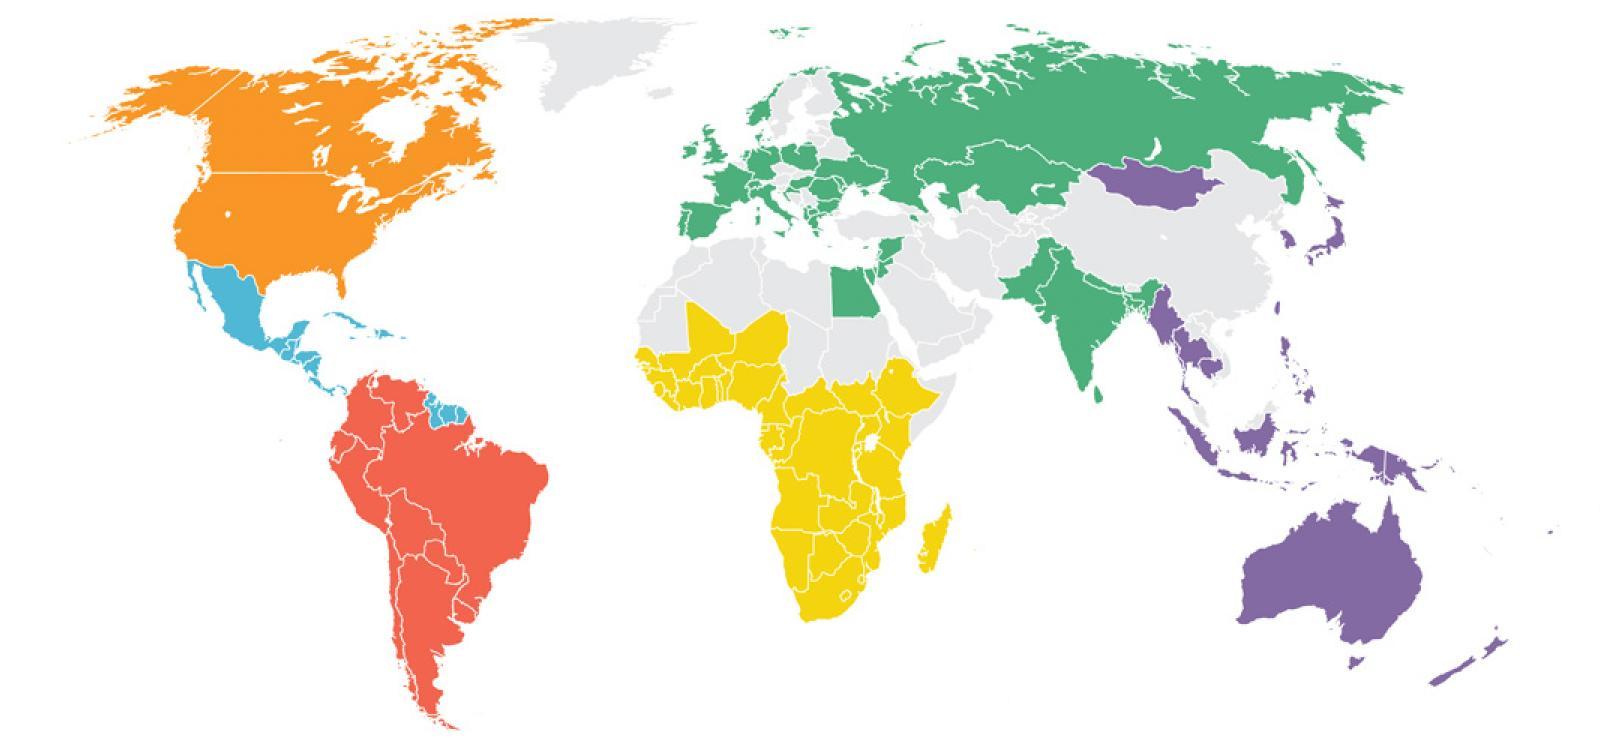 World Region Maps